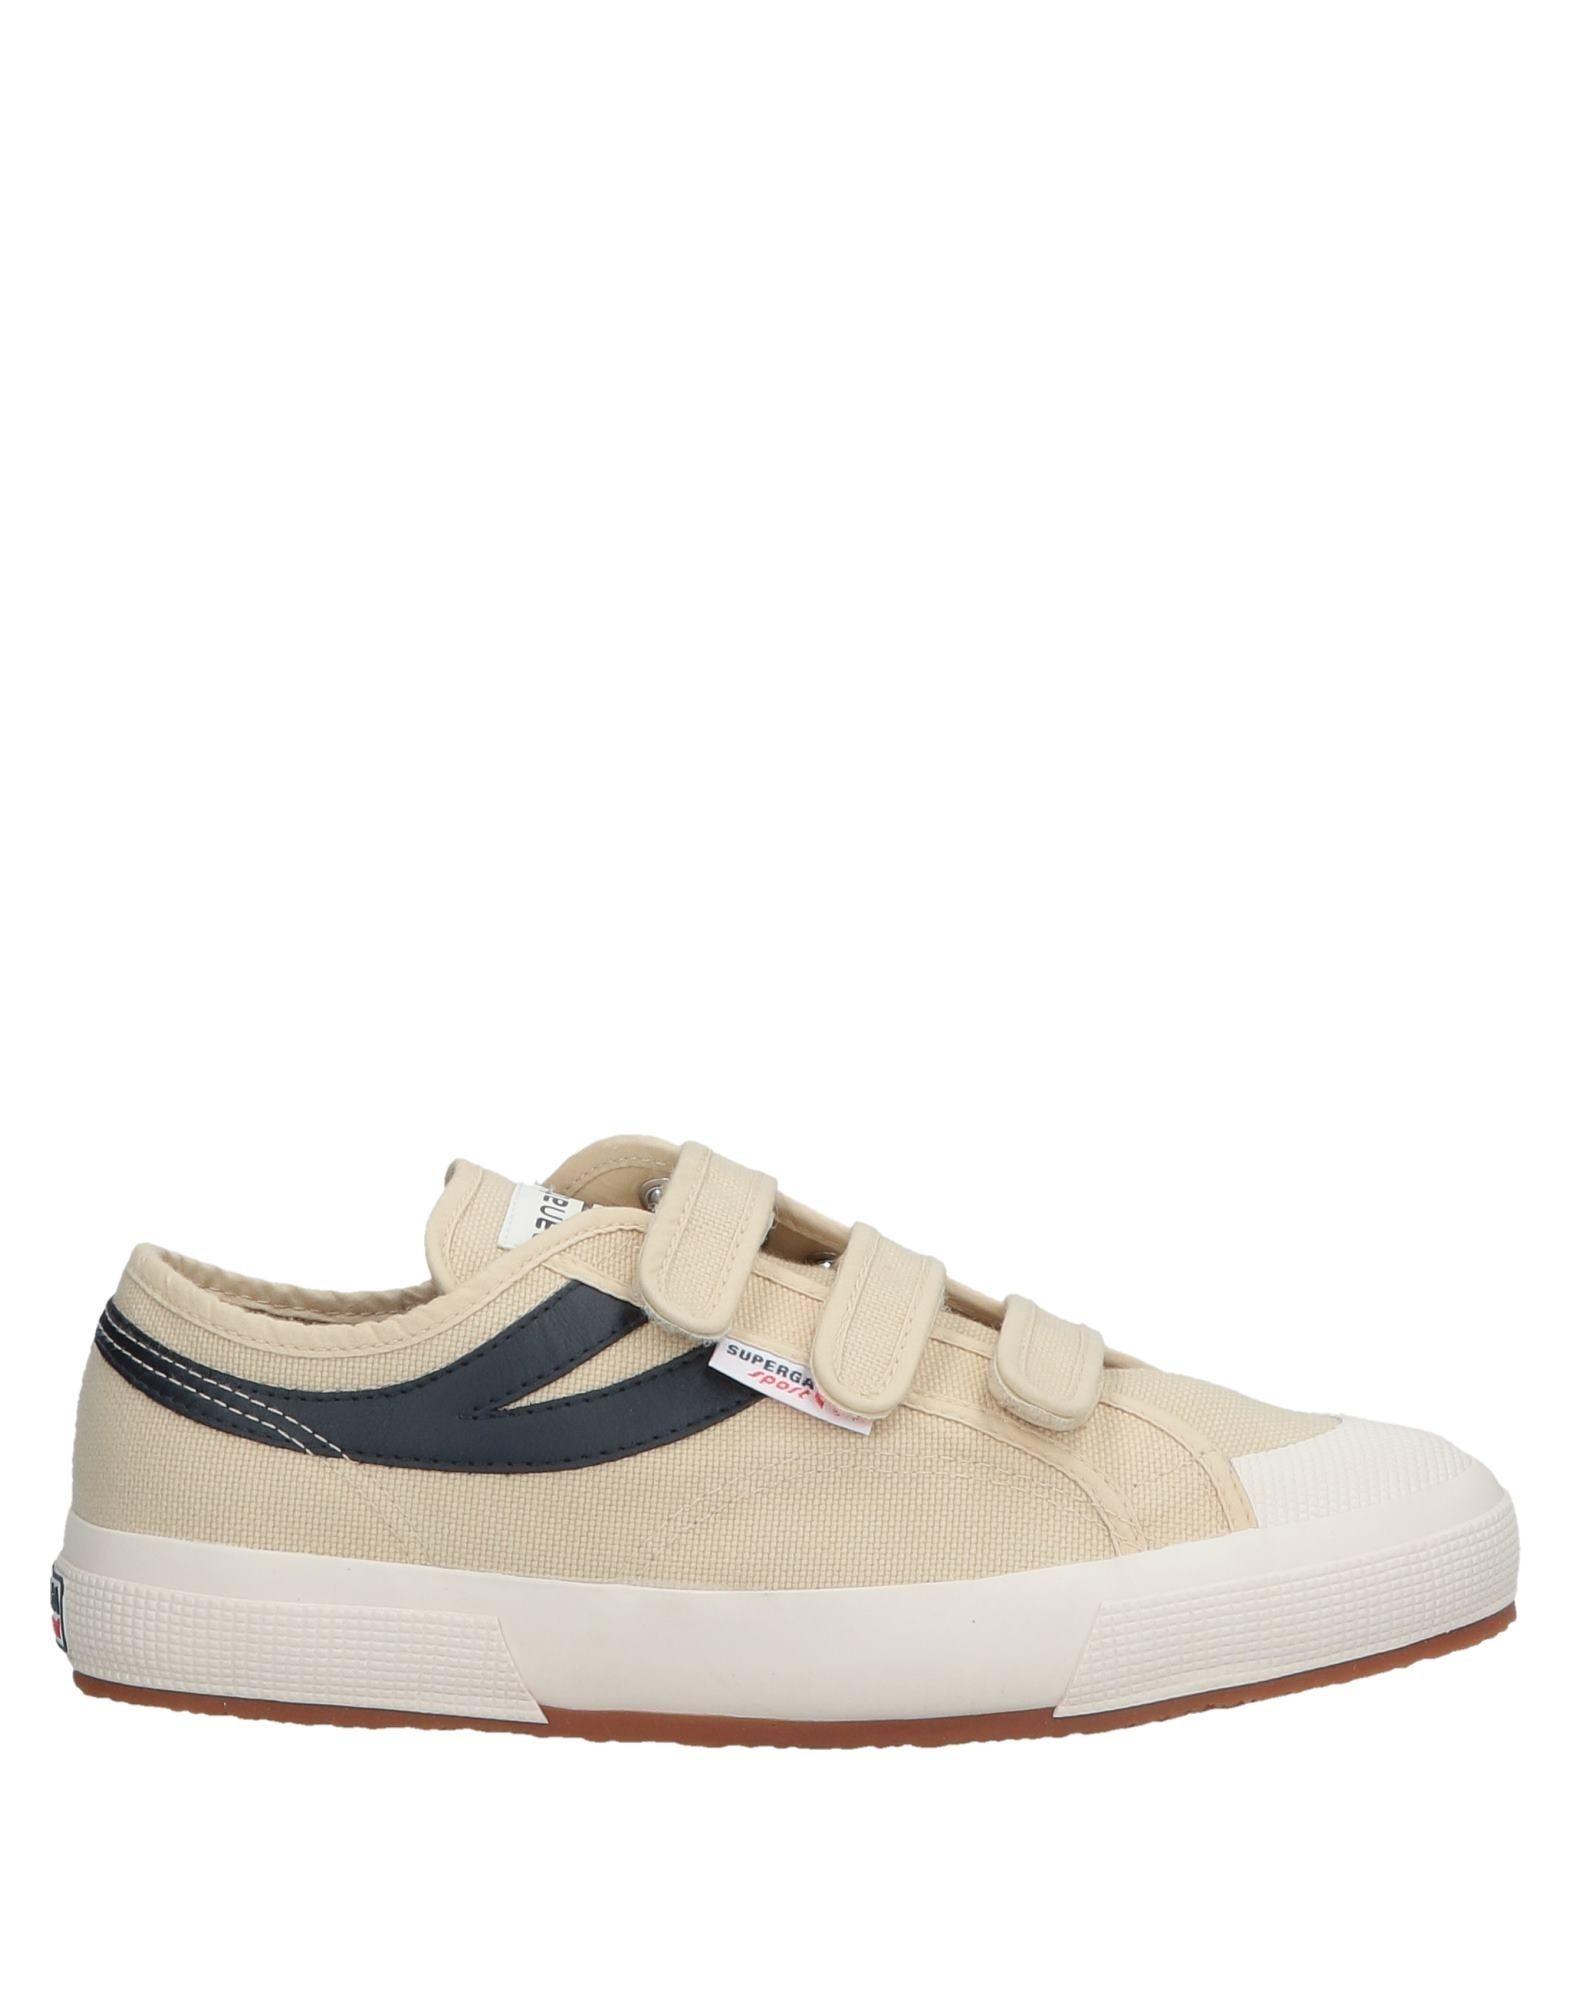 Rabatt echte Schuhe Superga® Sneakers Herren  11571417MF